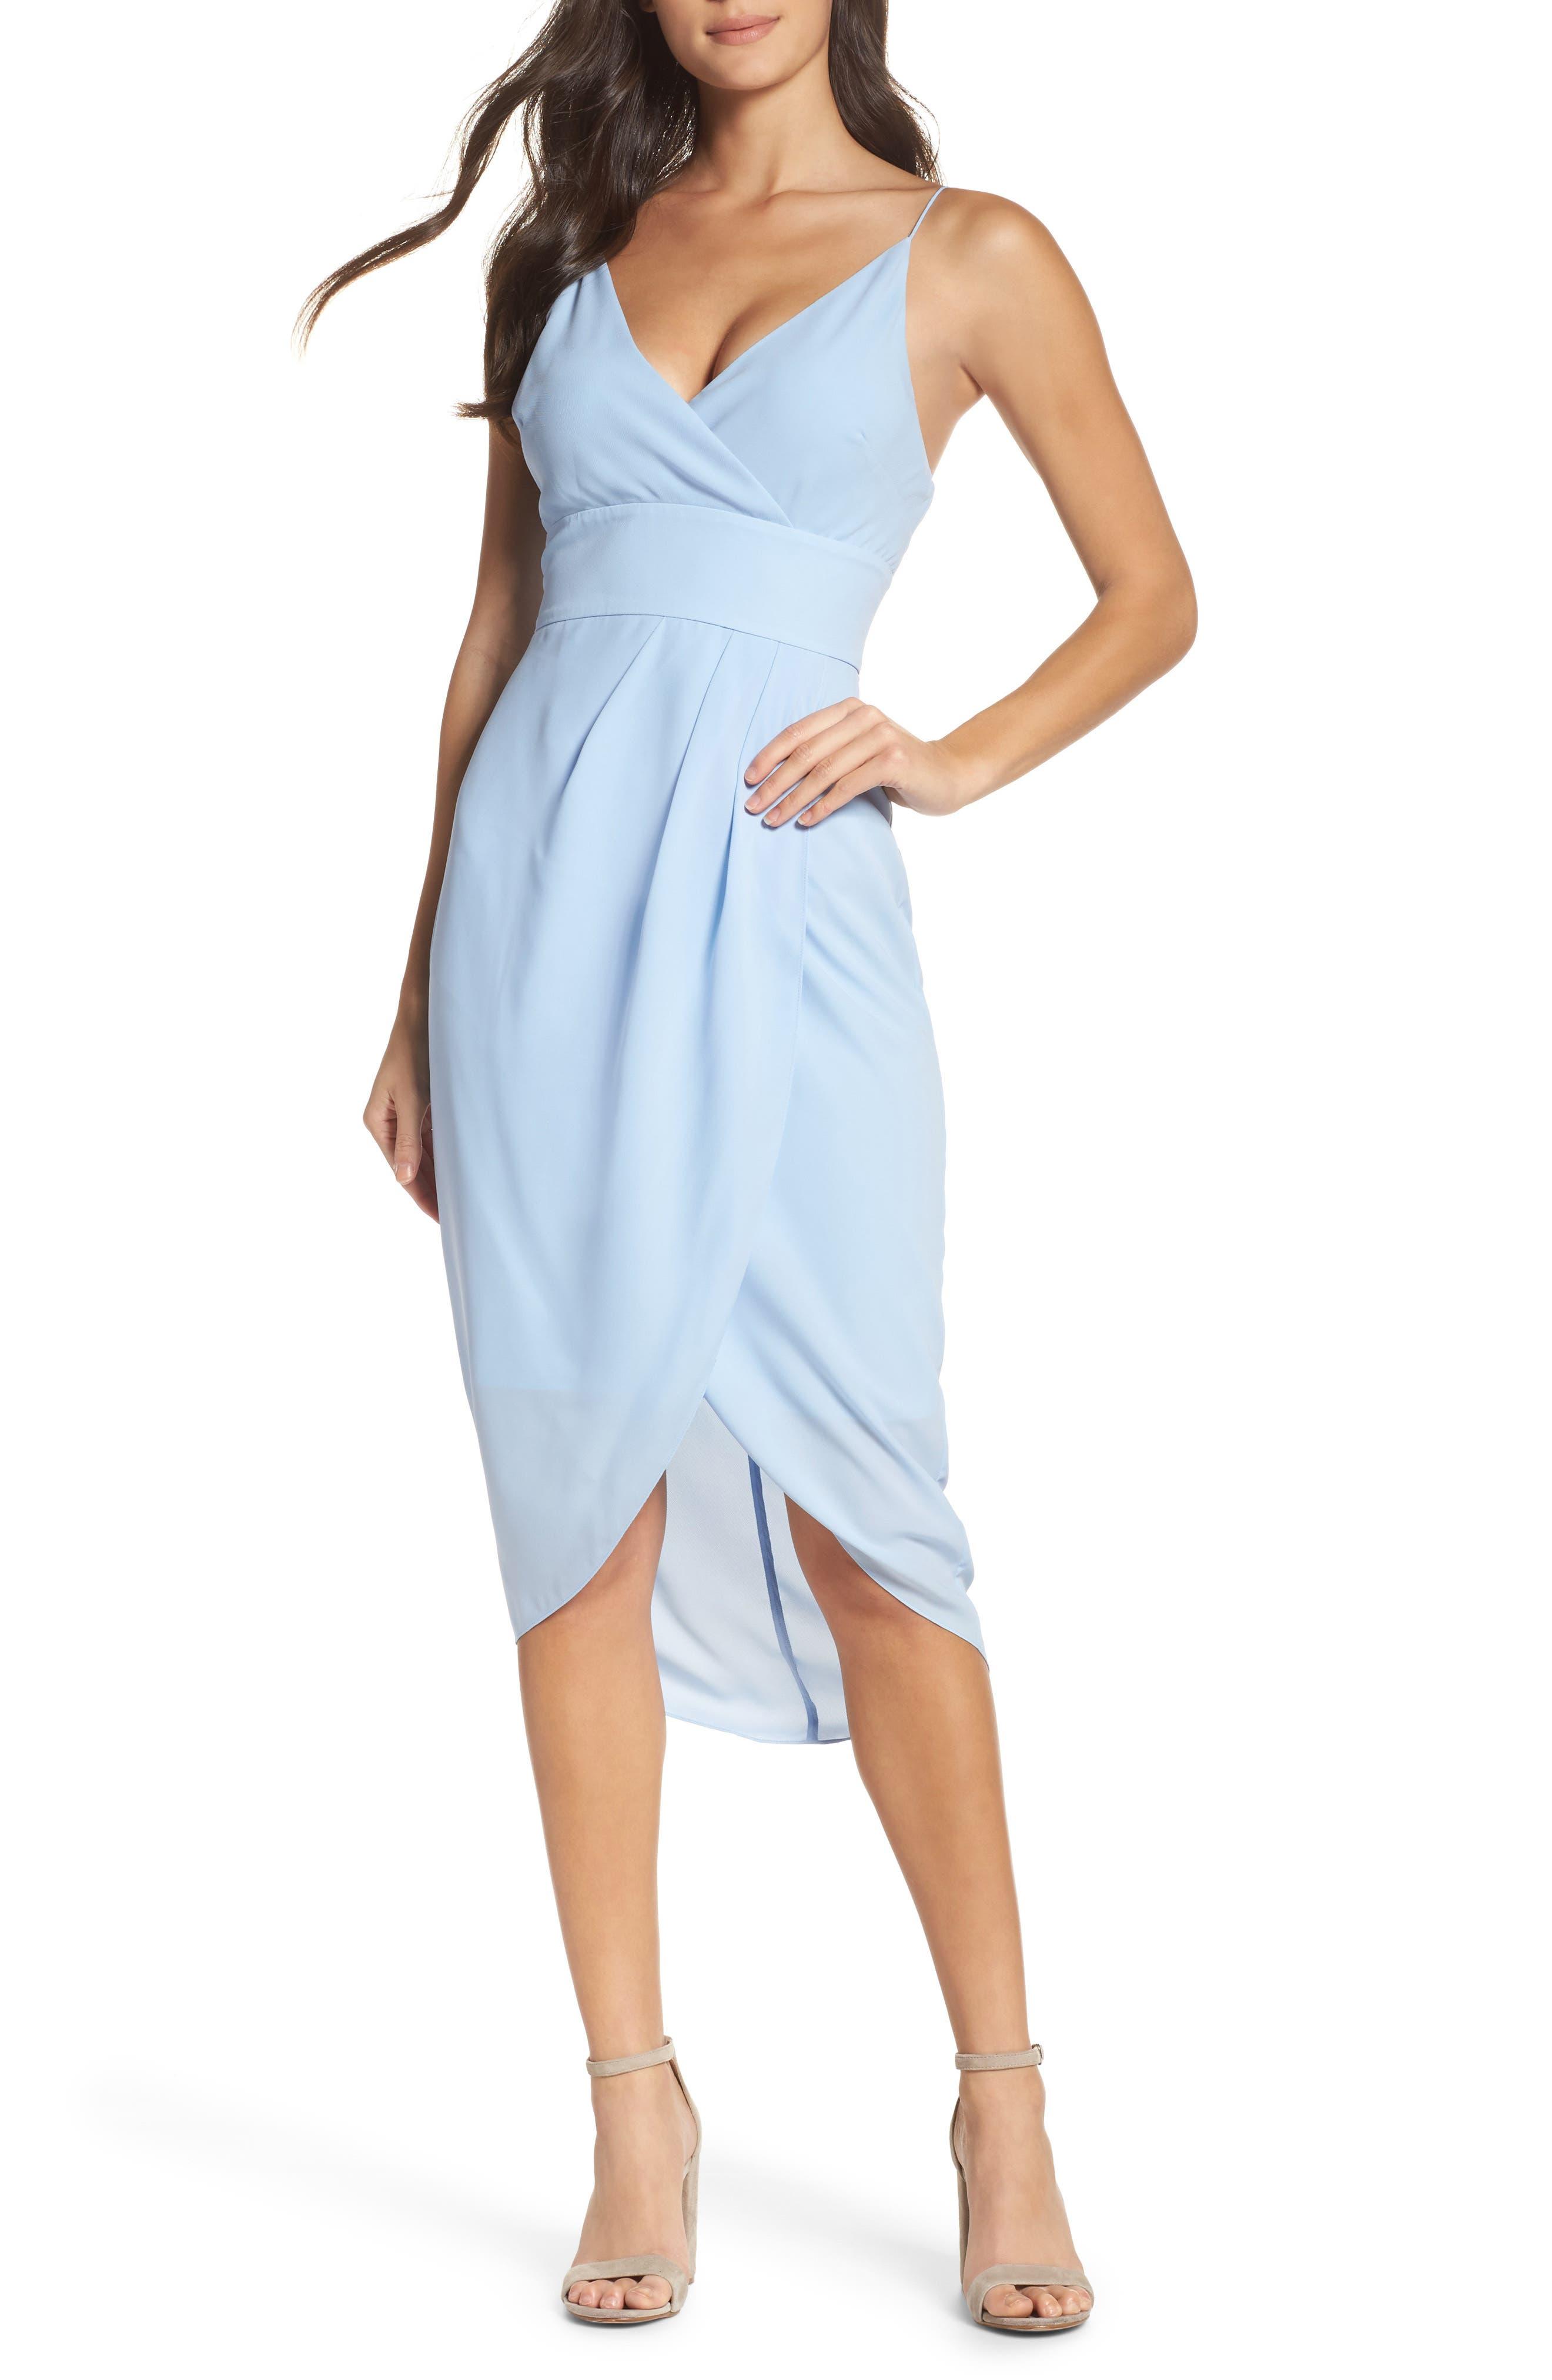 Main Image - Cooper St Lily Drape Sheath Dress